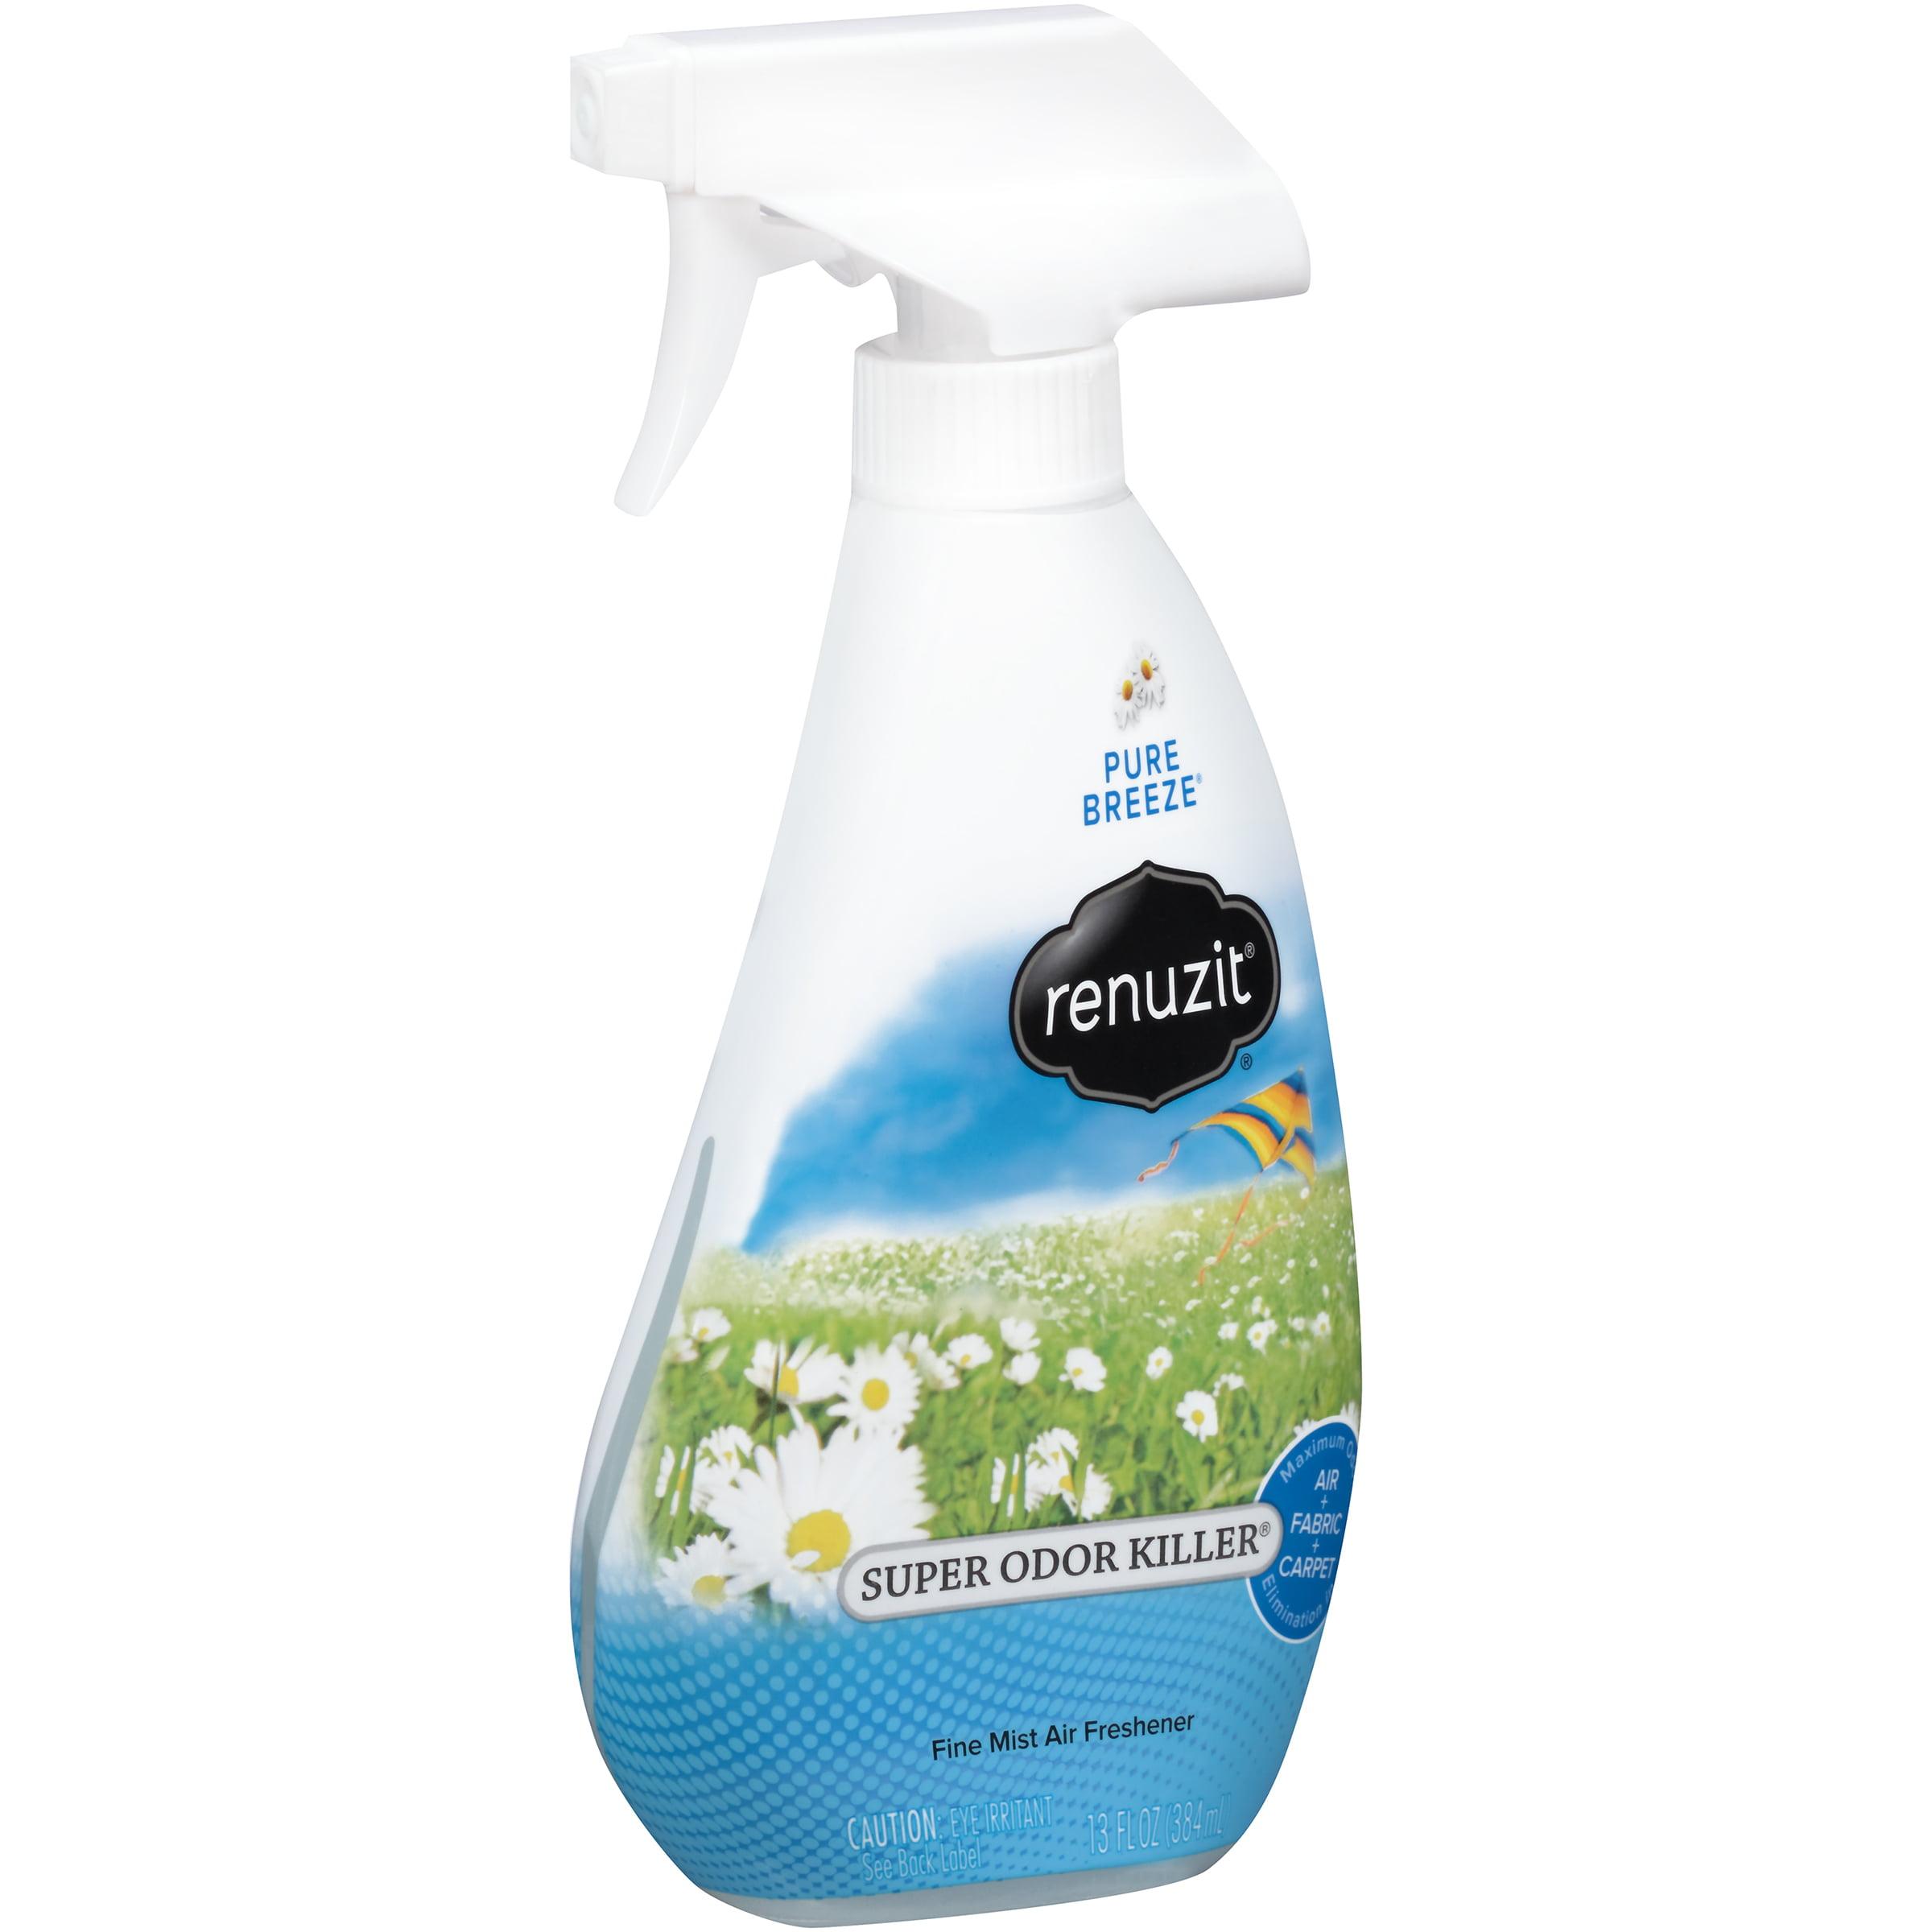 (3 Pack) Renuzit Super Odor Killer Pure Breeze Fine Mist Air Freshener, 13 fl oz